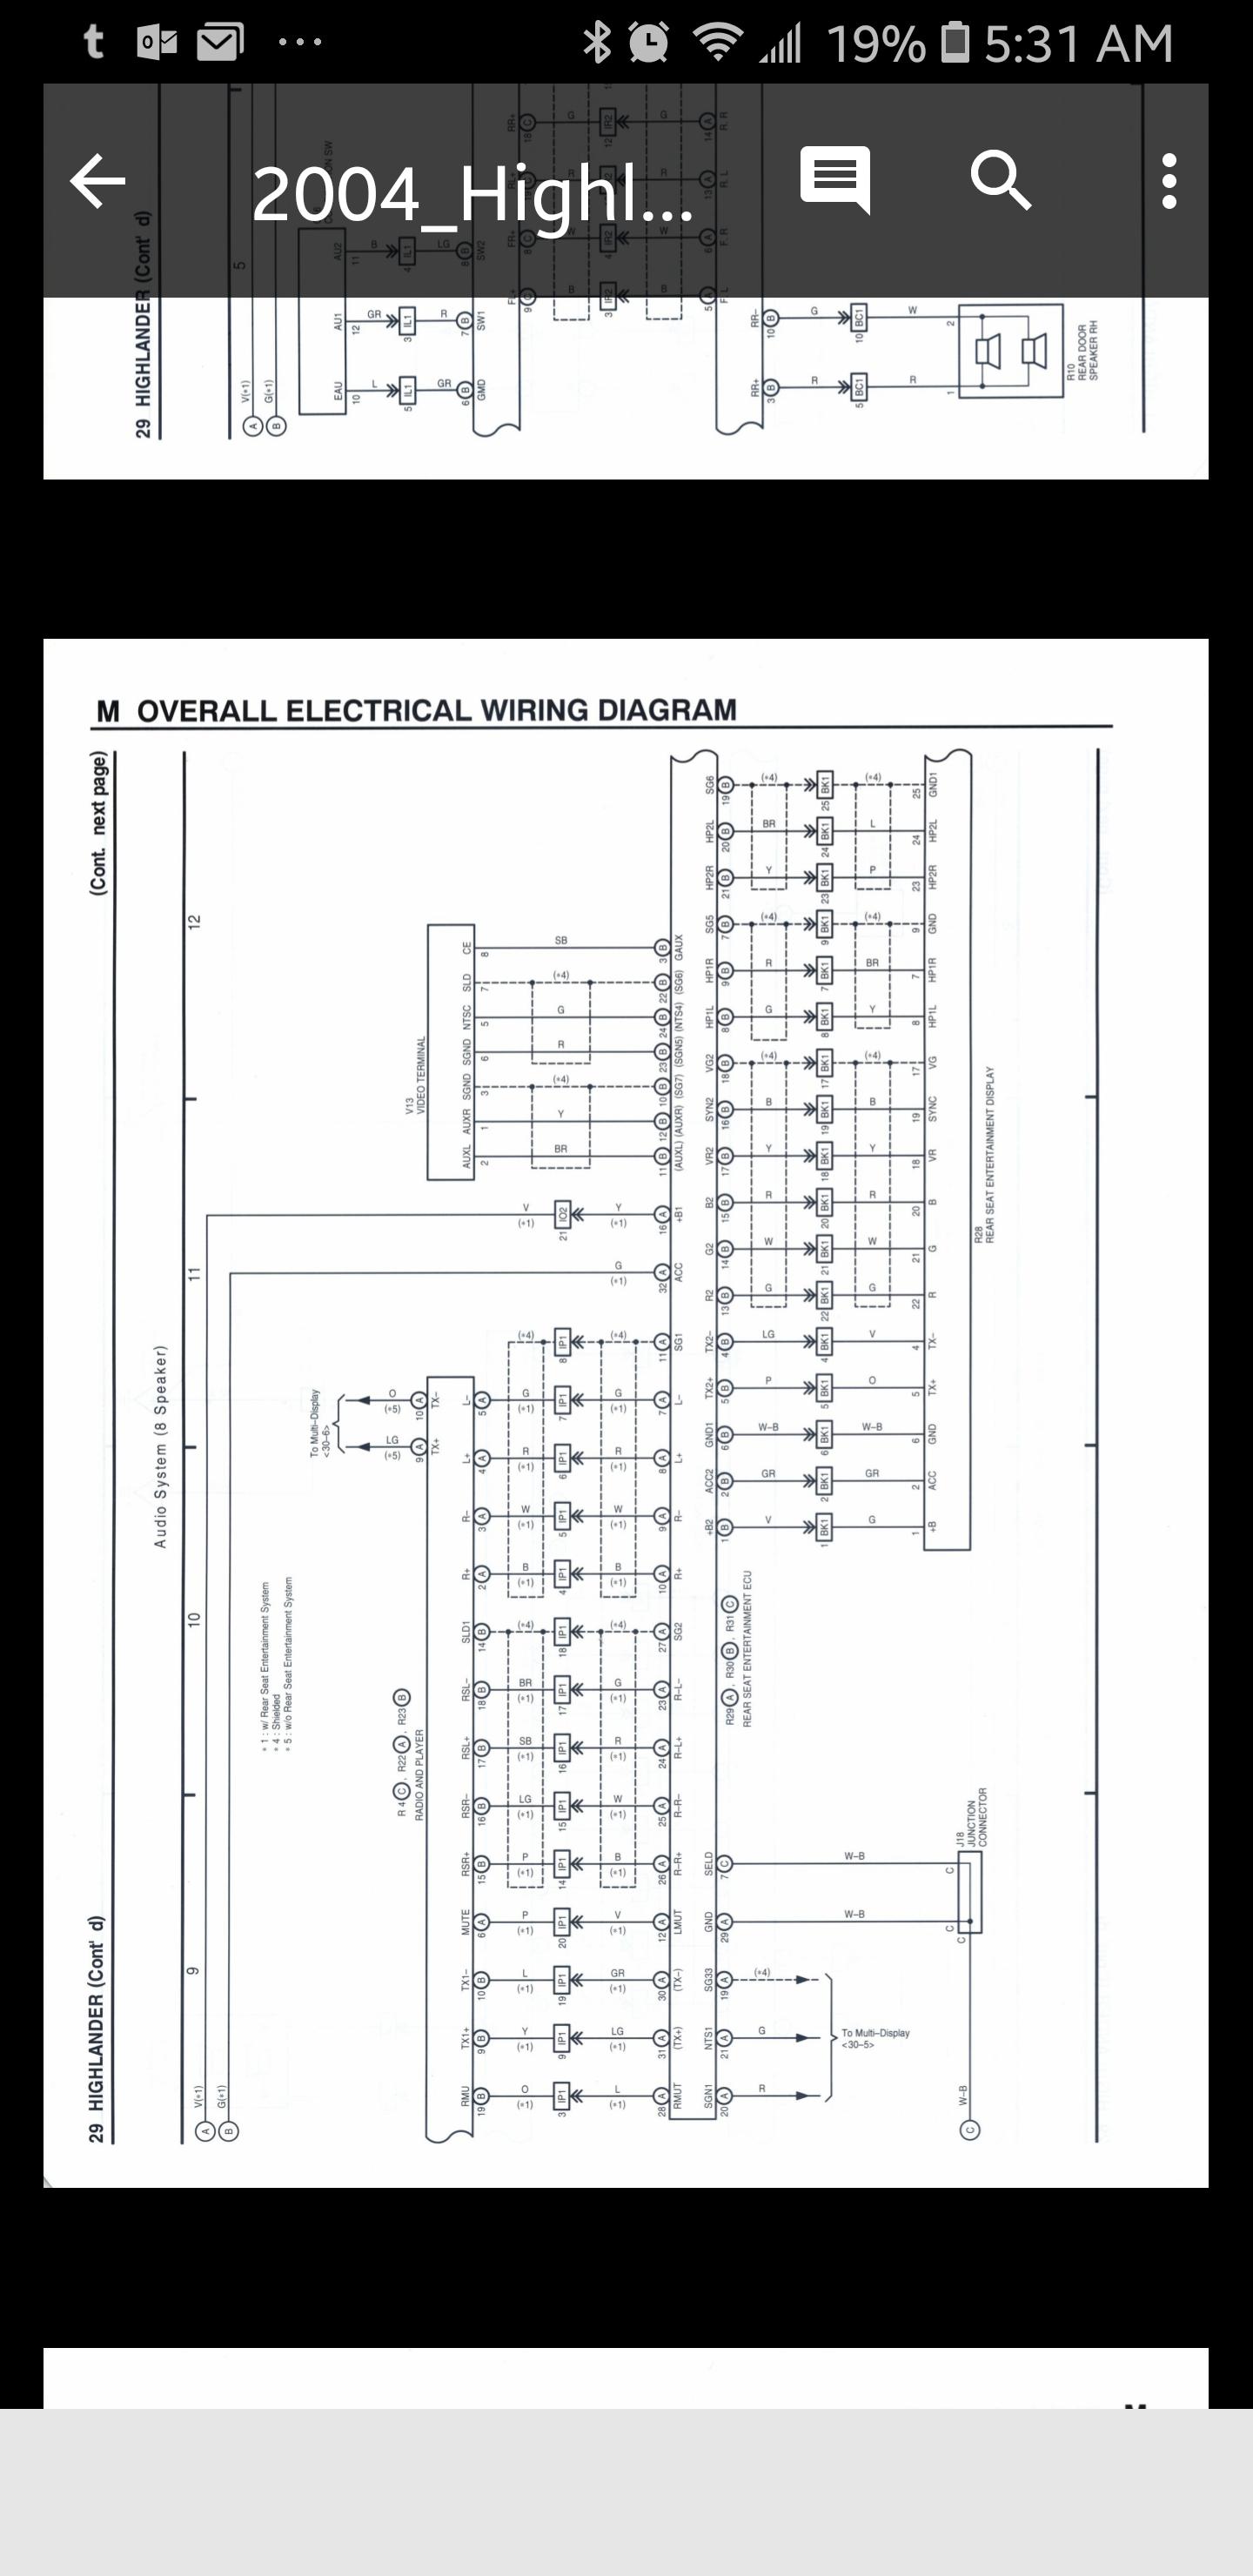 2007 Jbl Wiring Diagram - All Diagram Schematics Jbl Wiring Diagram Toyota Highlander on